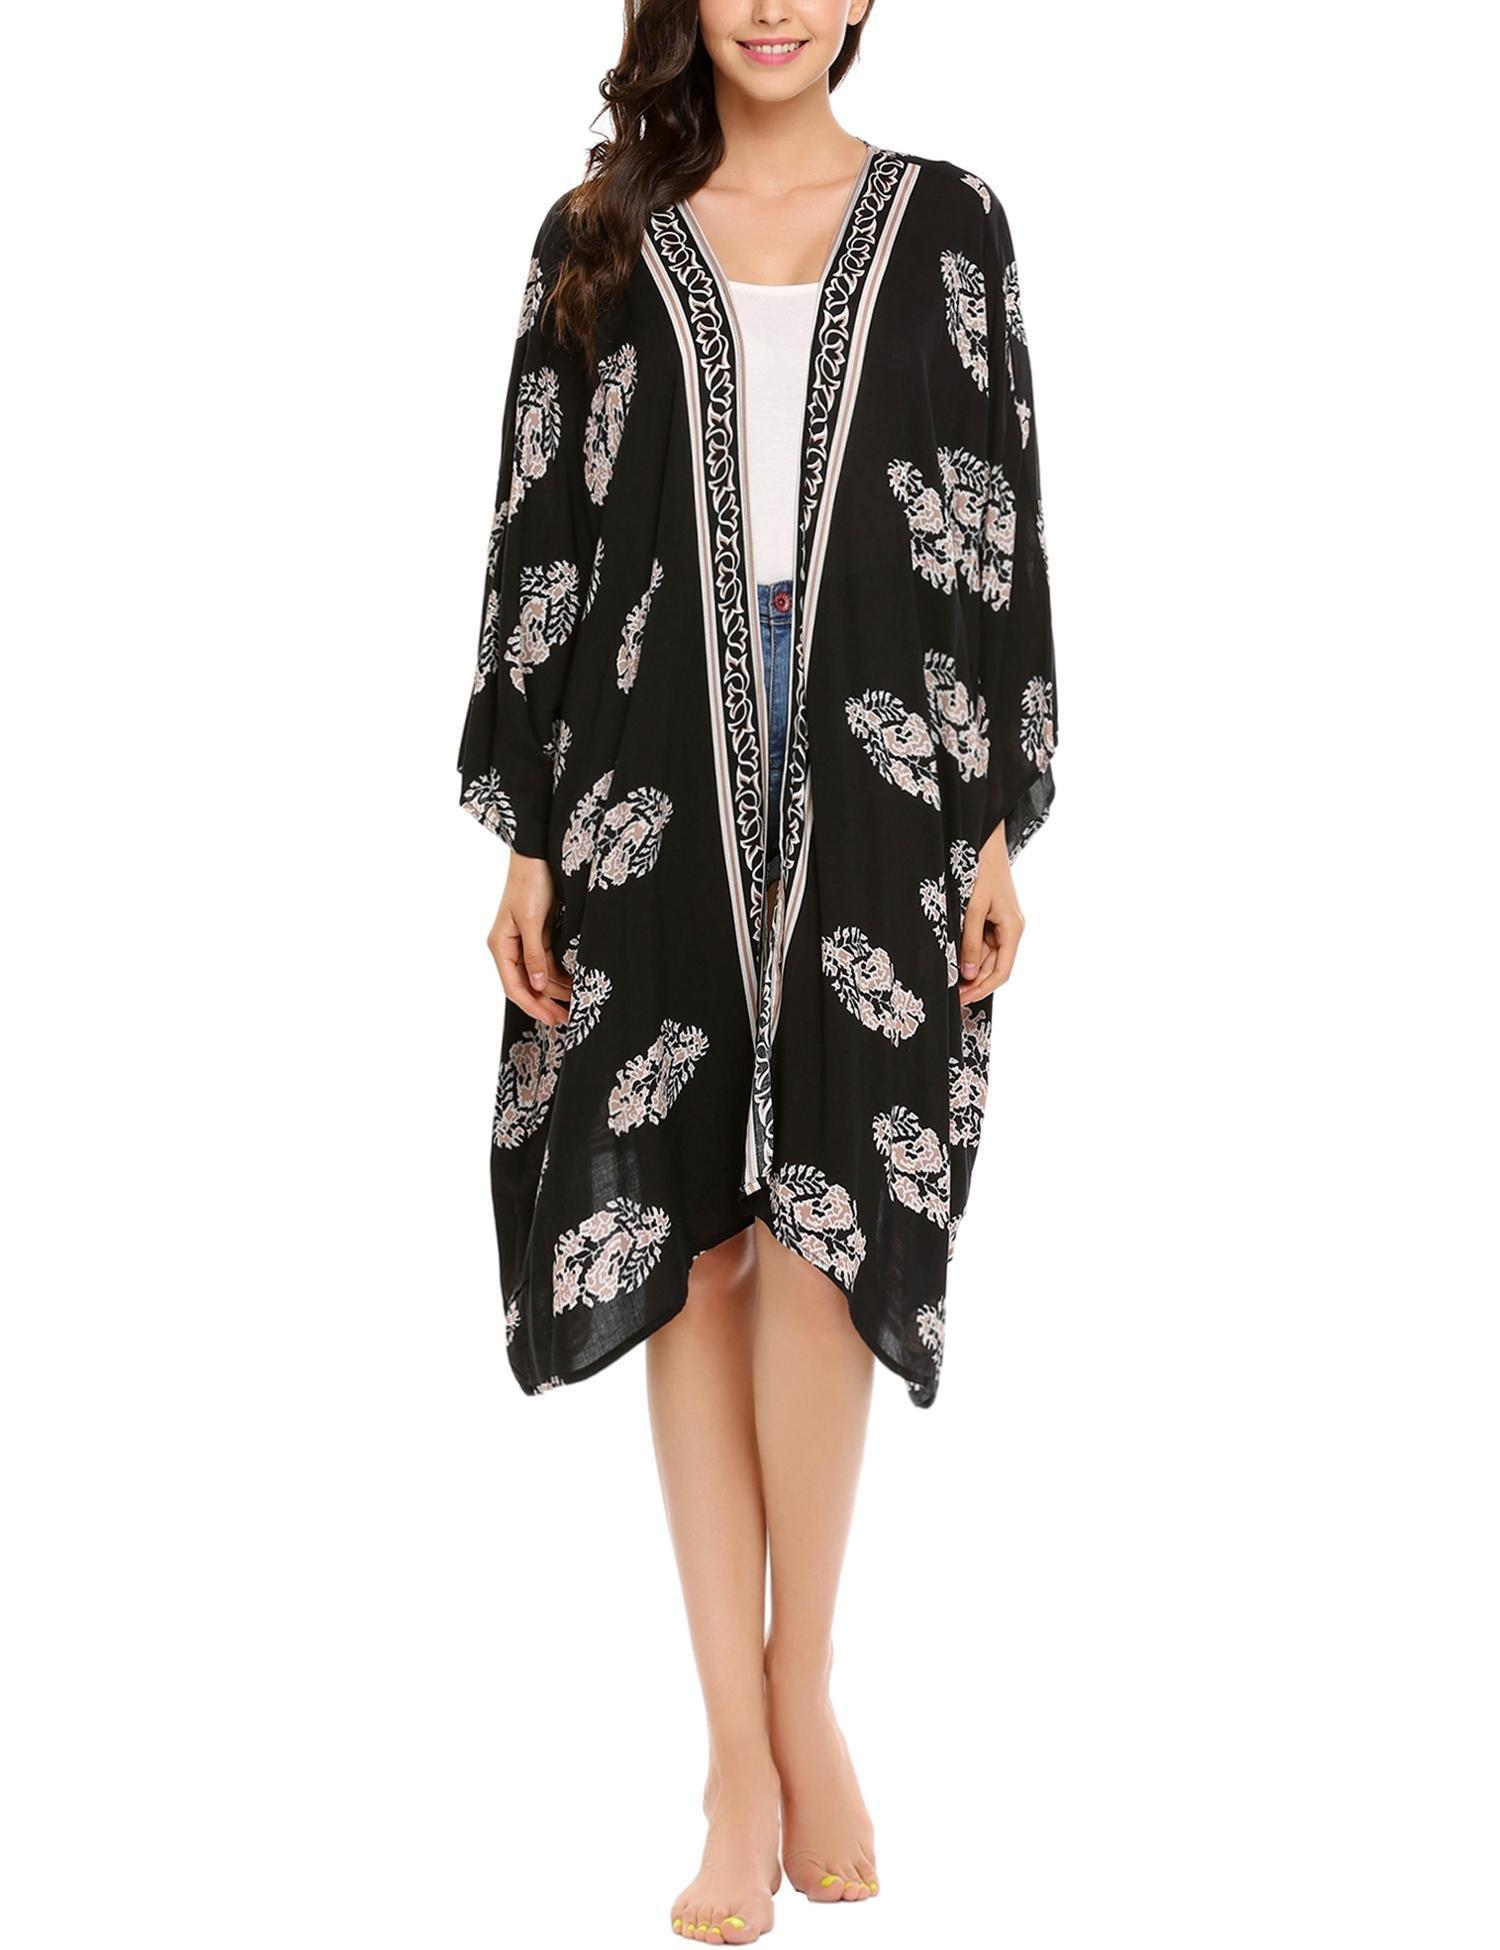 Zeagoo Women's Cute Floral Chiffon Kimono Cardigan Blouse Beach Cover up Black M